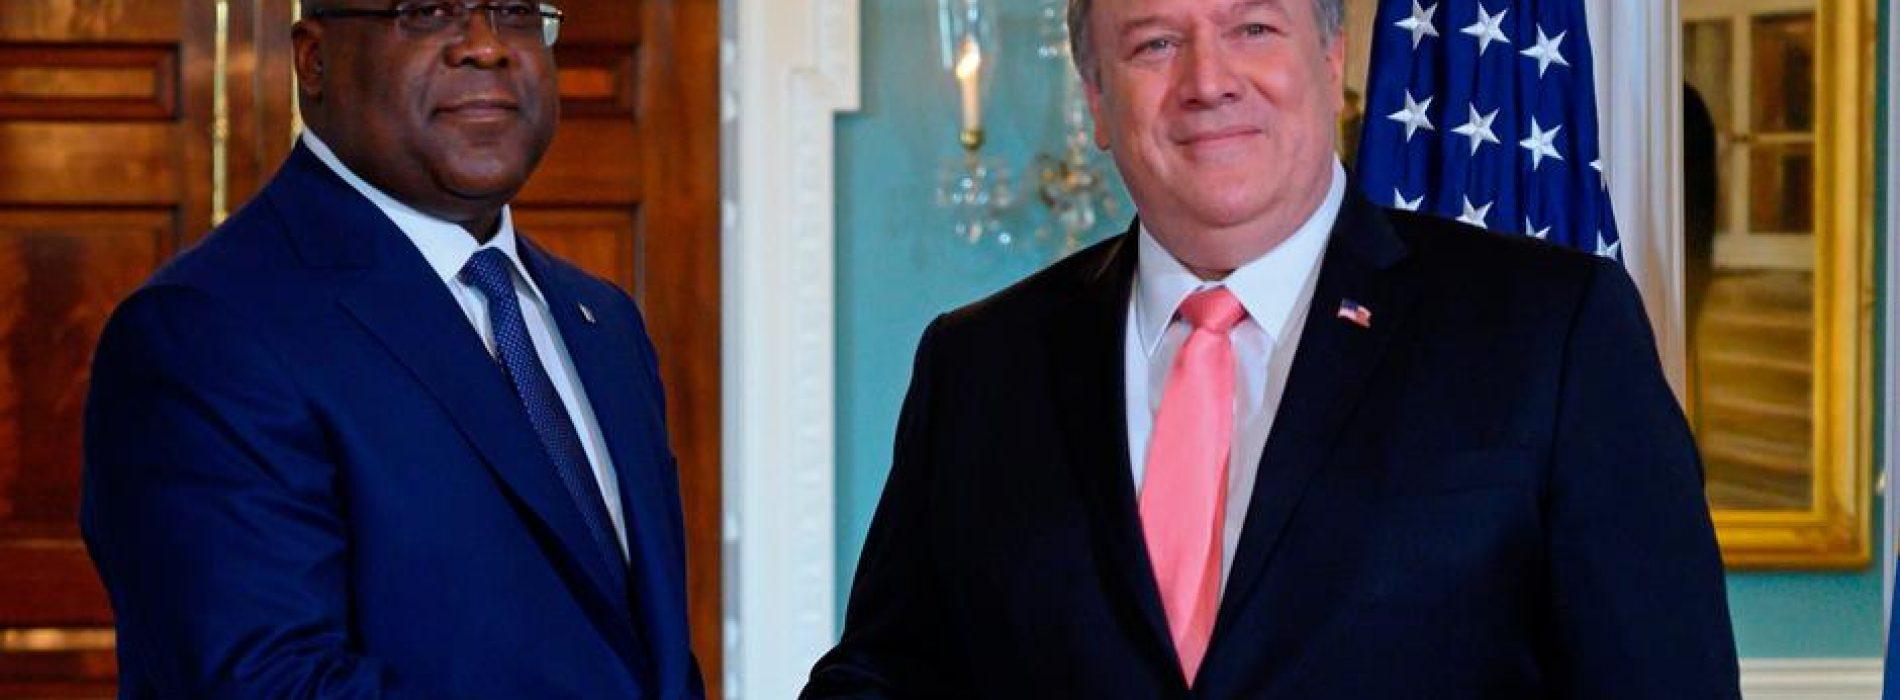 RDC: Felix Tshisekedi si avvicina agli Stati Uniti